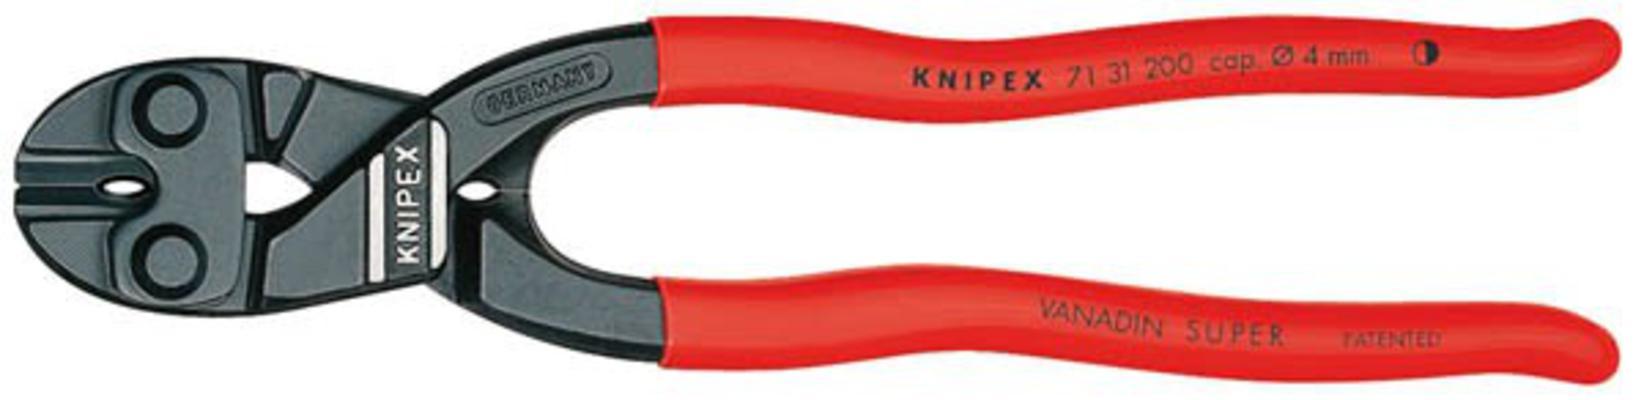 Pulttisakset 200 mm avarruksella, Knipex - Pulttisakset avarruksella, 200 mm